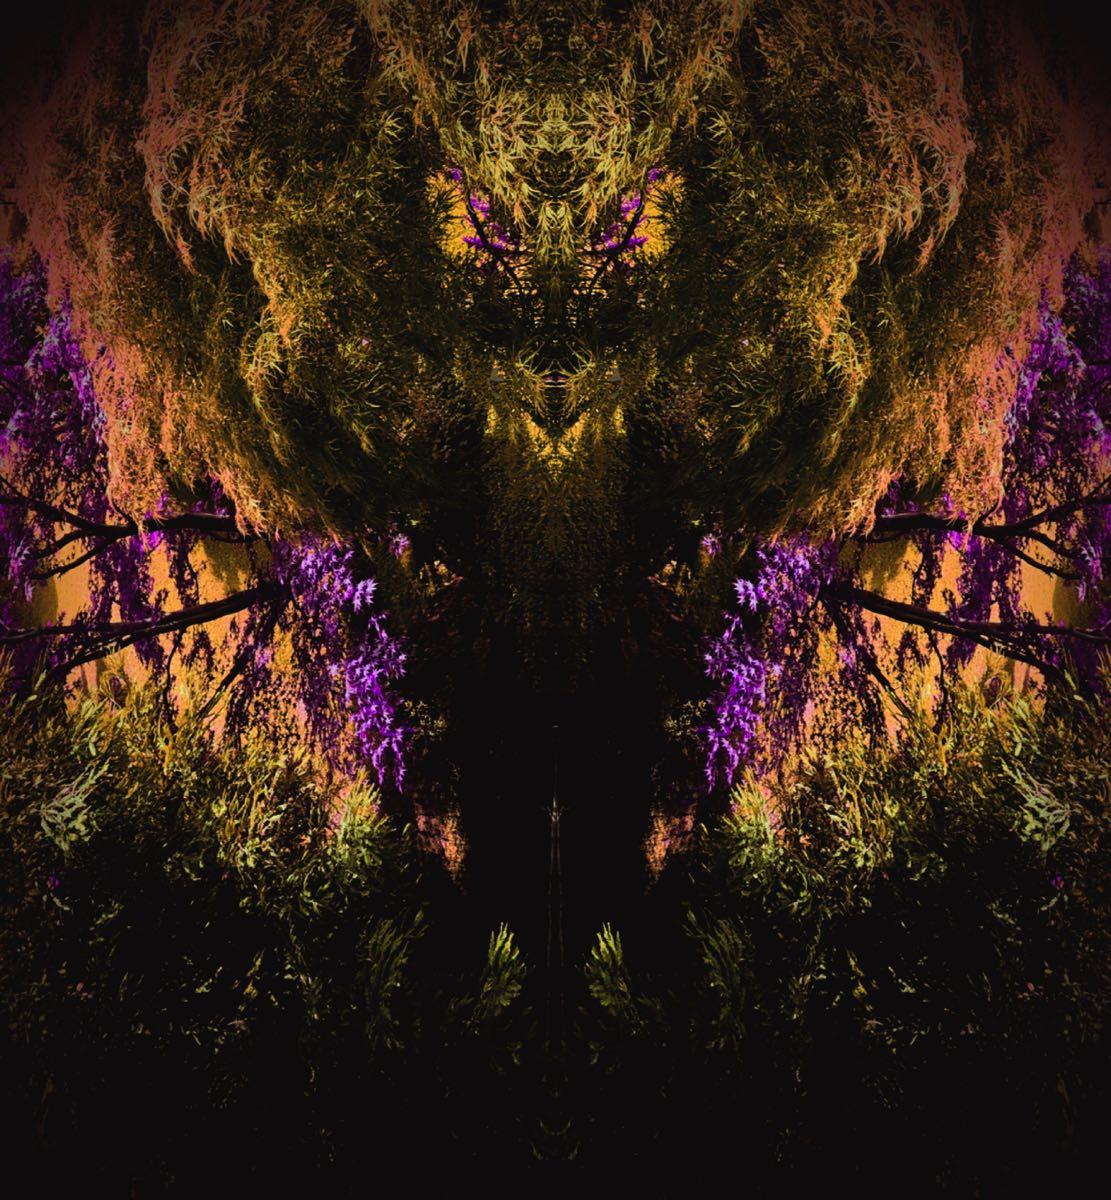 Subconscious - Tree Creatures #6 (40x40 cm) - Print on cotton paper 2020